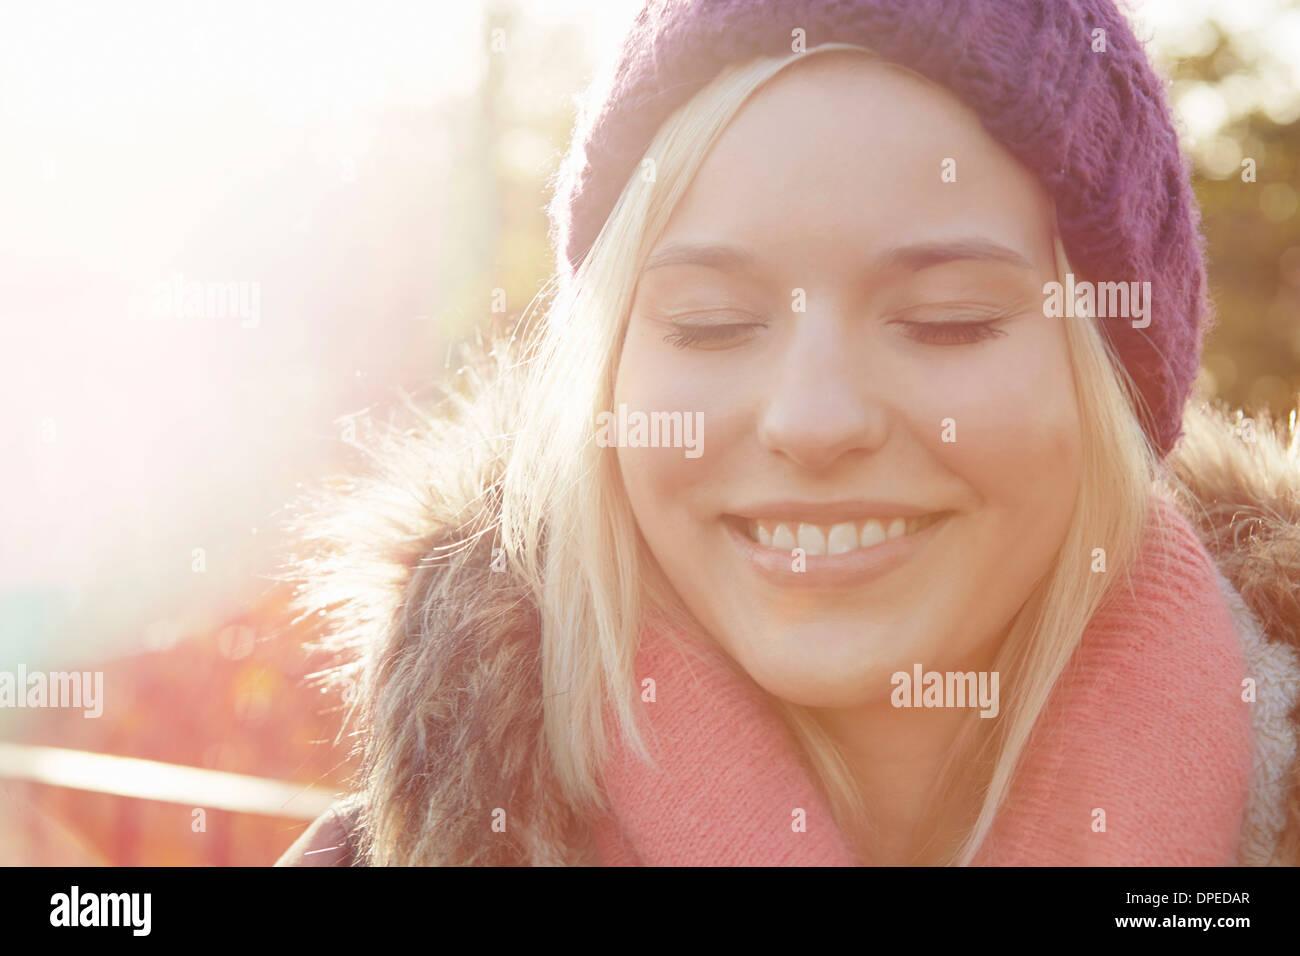 Porträt der jungen Frau mit Stricken Hut, Augen geschlossen Stockbild